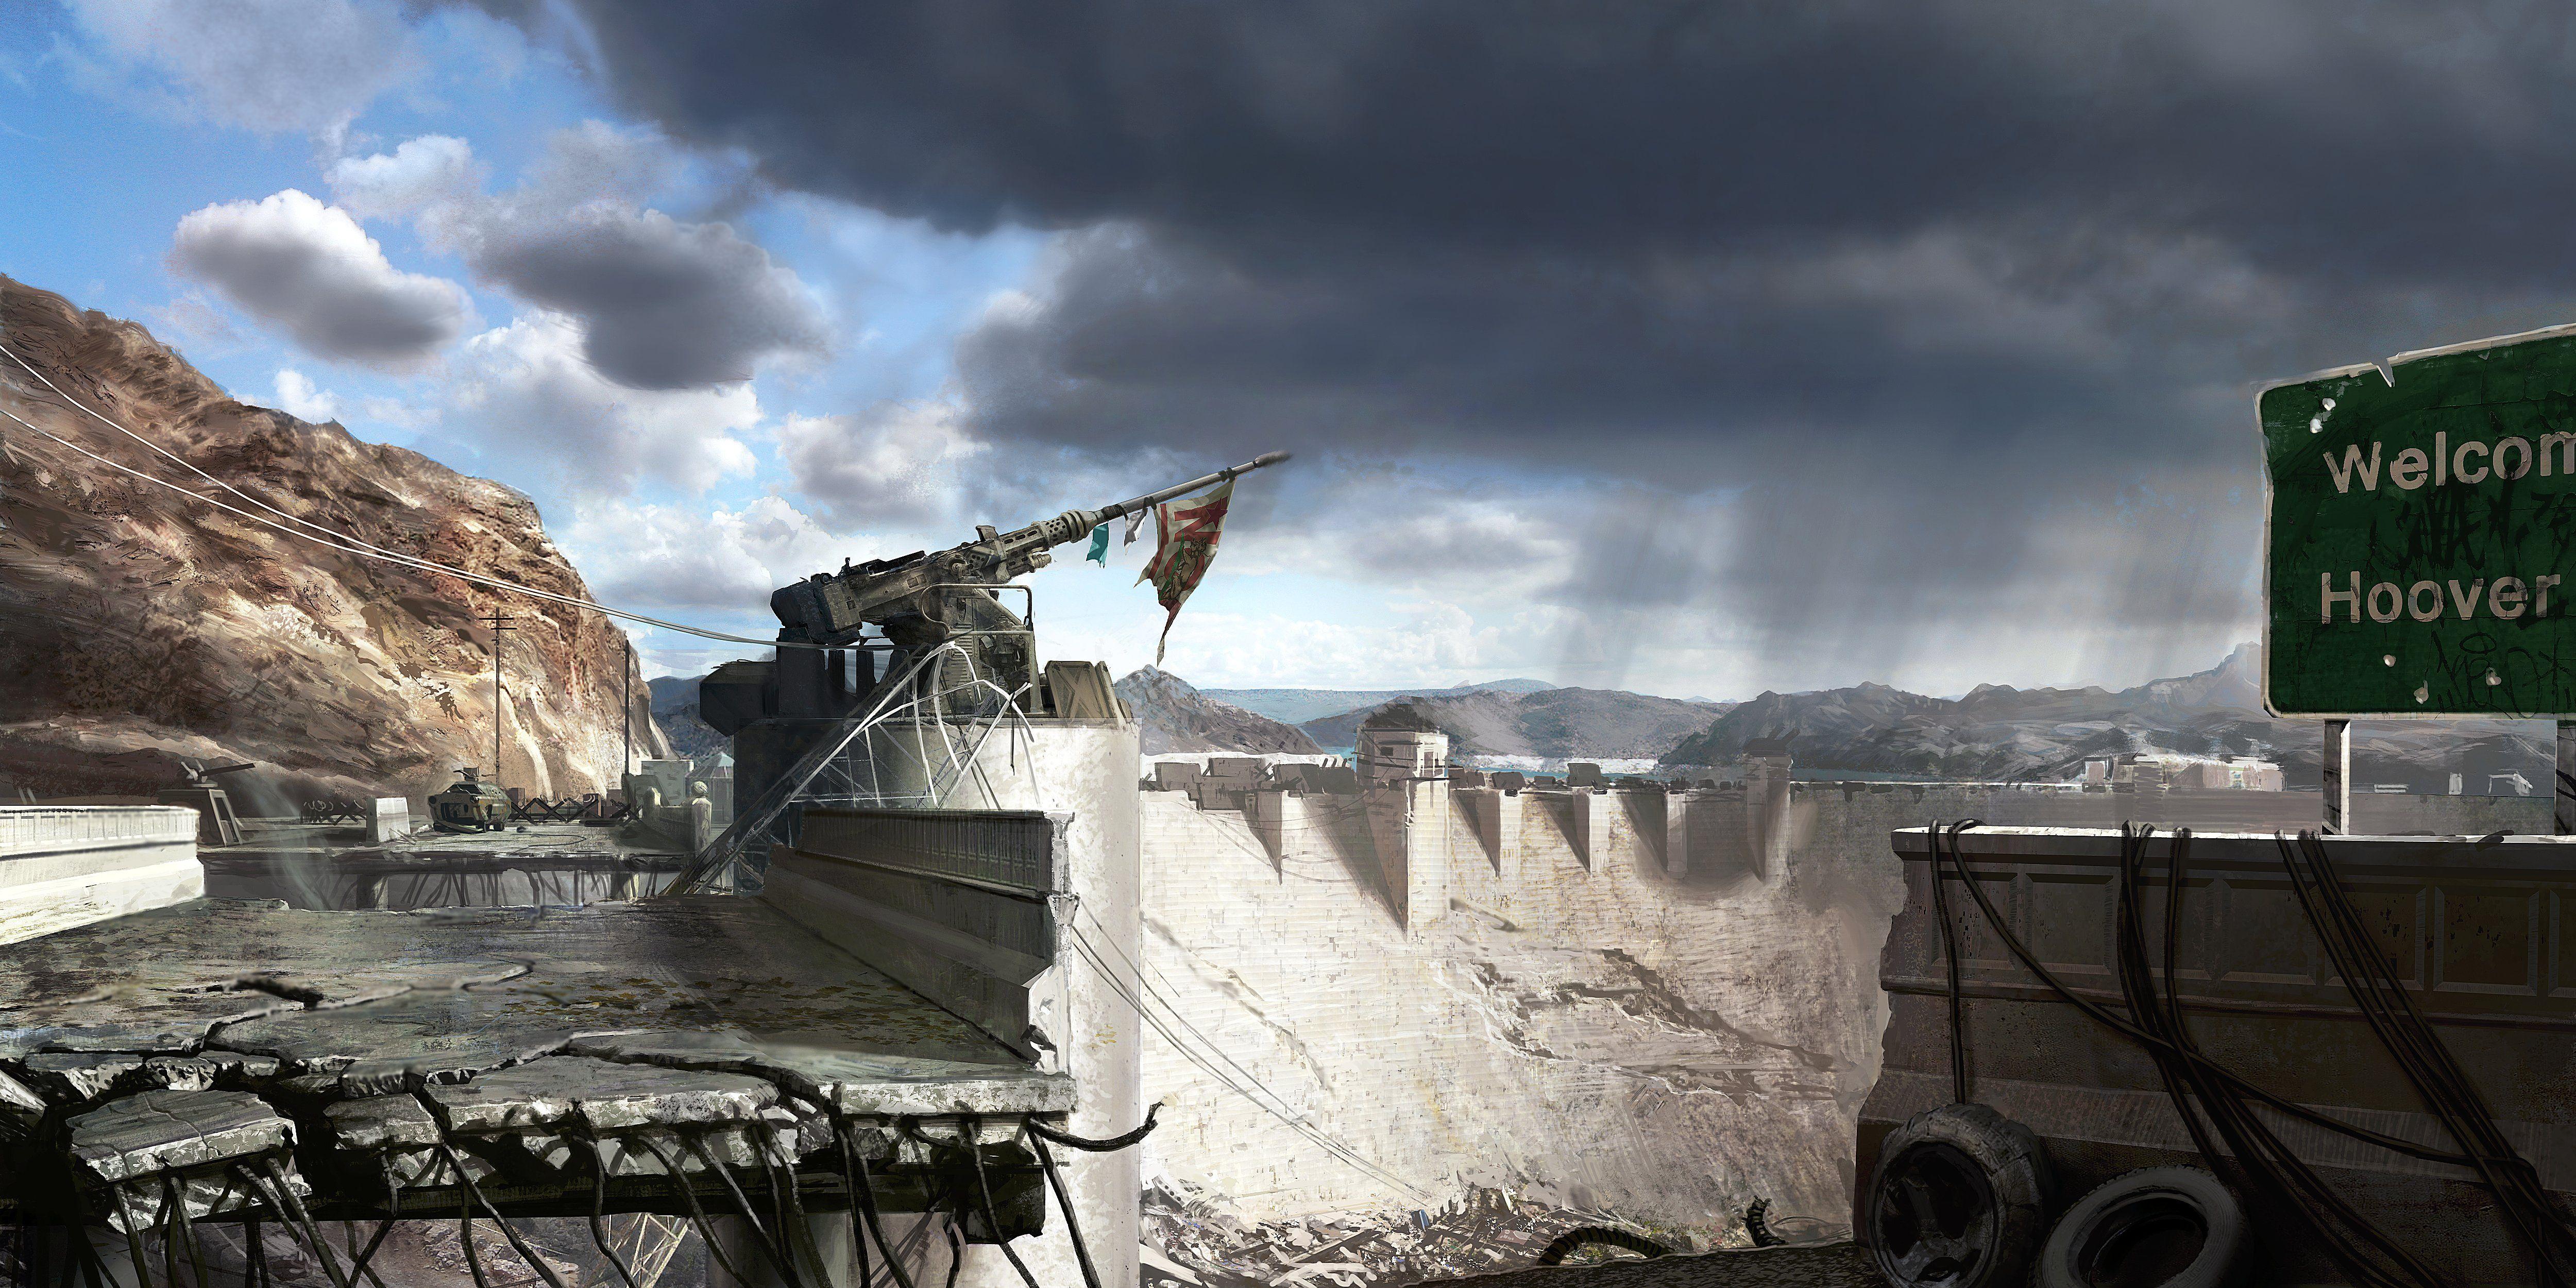 Pin By Jd Redding On Gaming Fallout Fallout Wallpaper Fallout New Vegas World Wallpaper